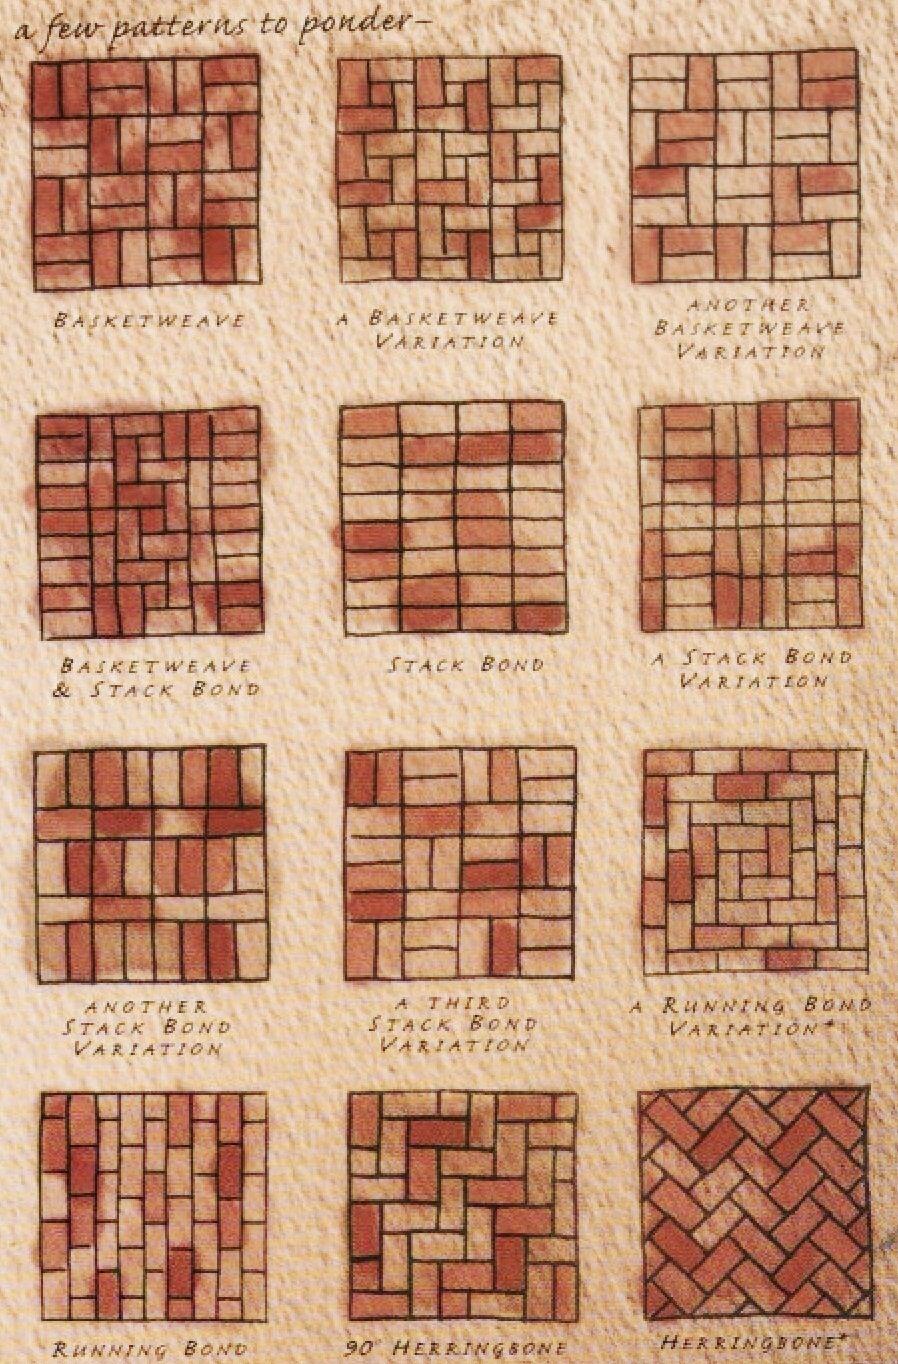 Basket weave brick pattern - Jojo Post Weeds Brick Patterns